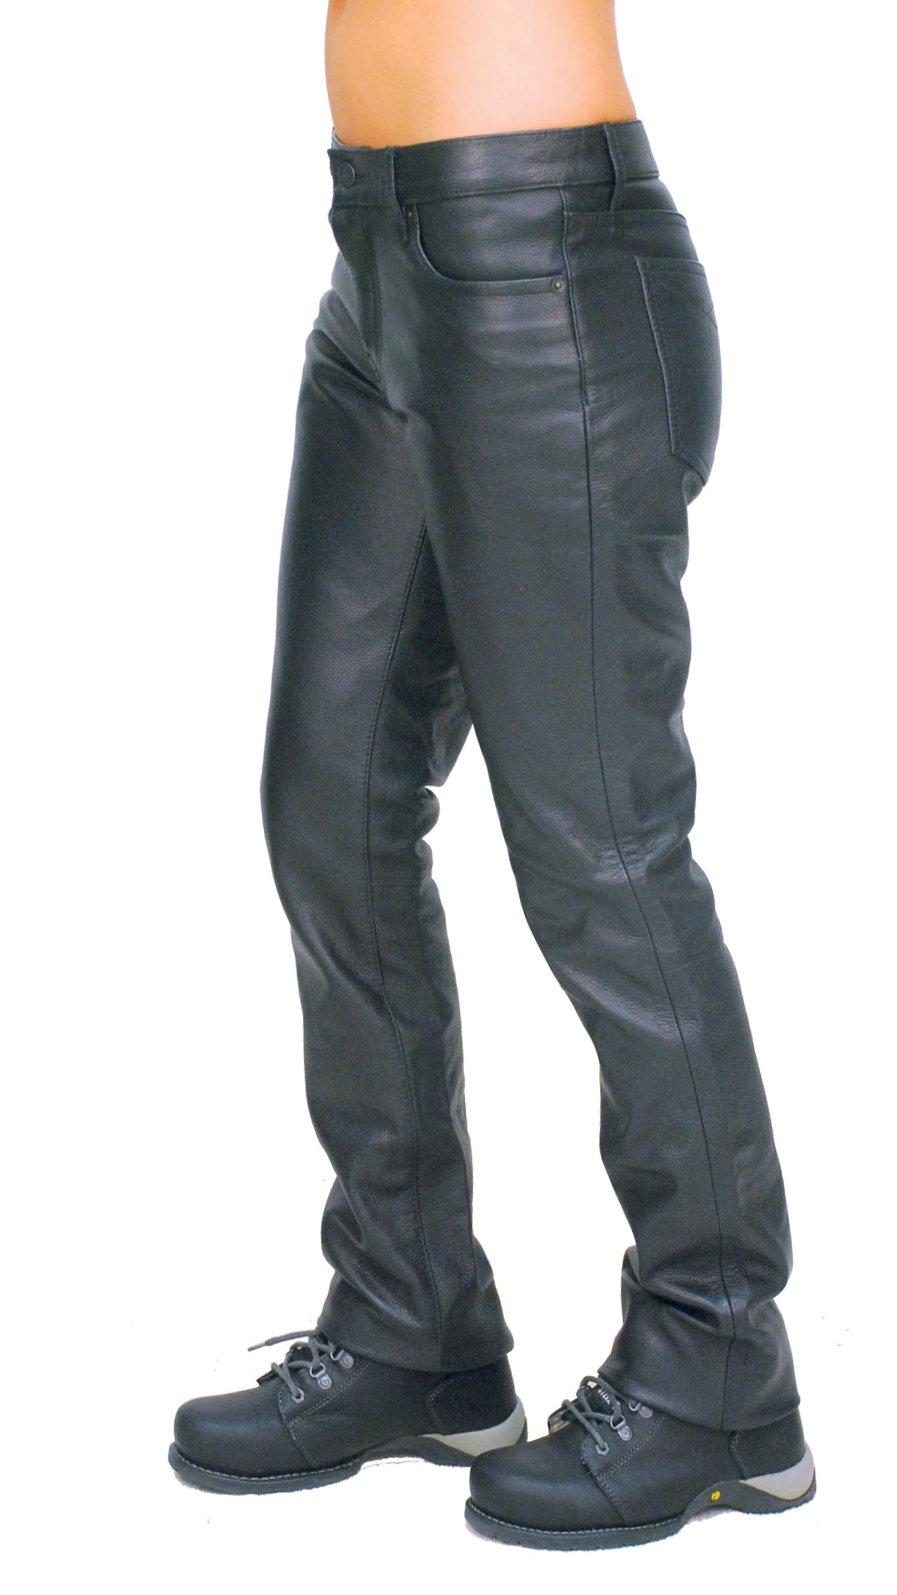 Jamin' Leather Women's Mid-Rise Premium Cowhide Leather Pants (12) #LP711K